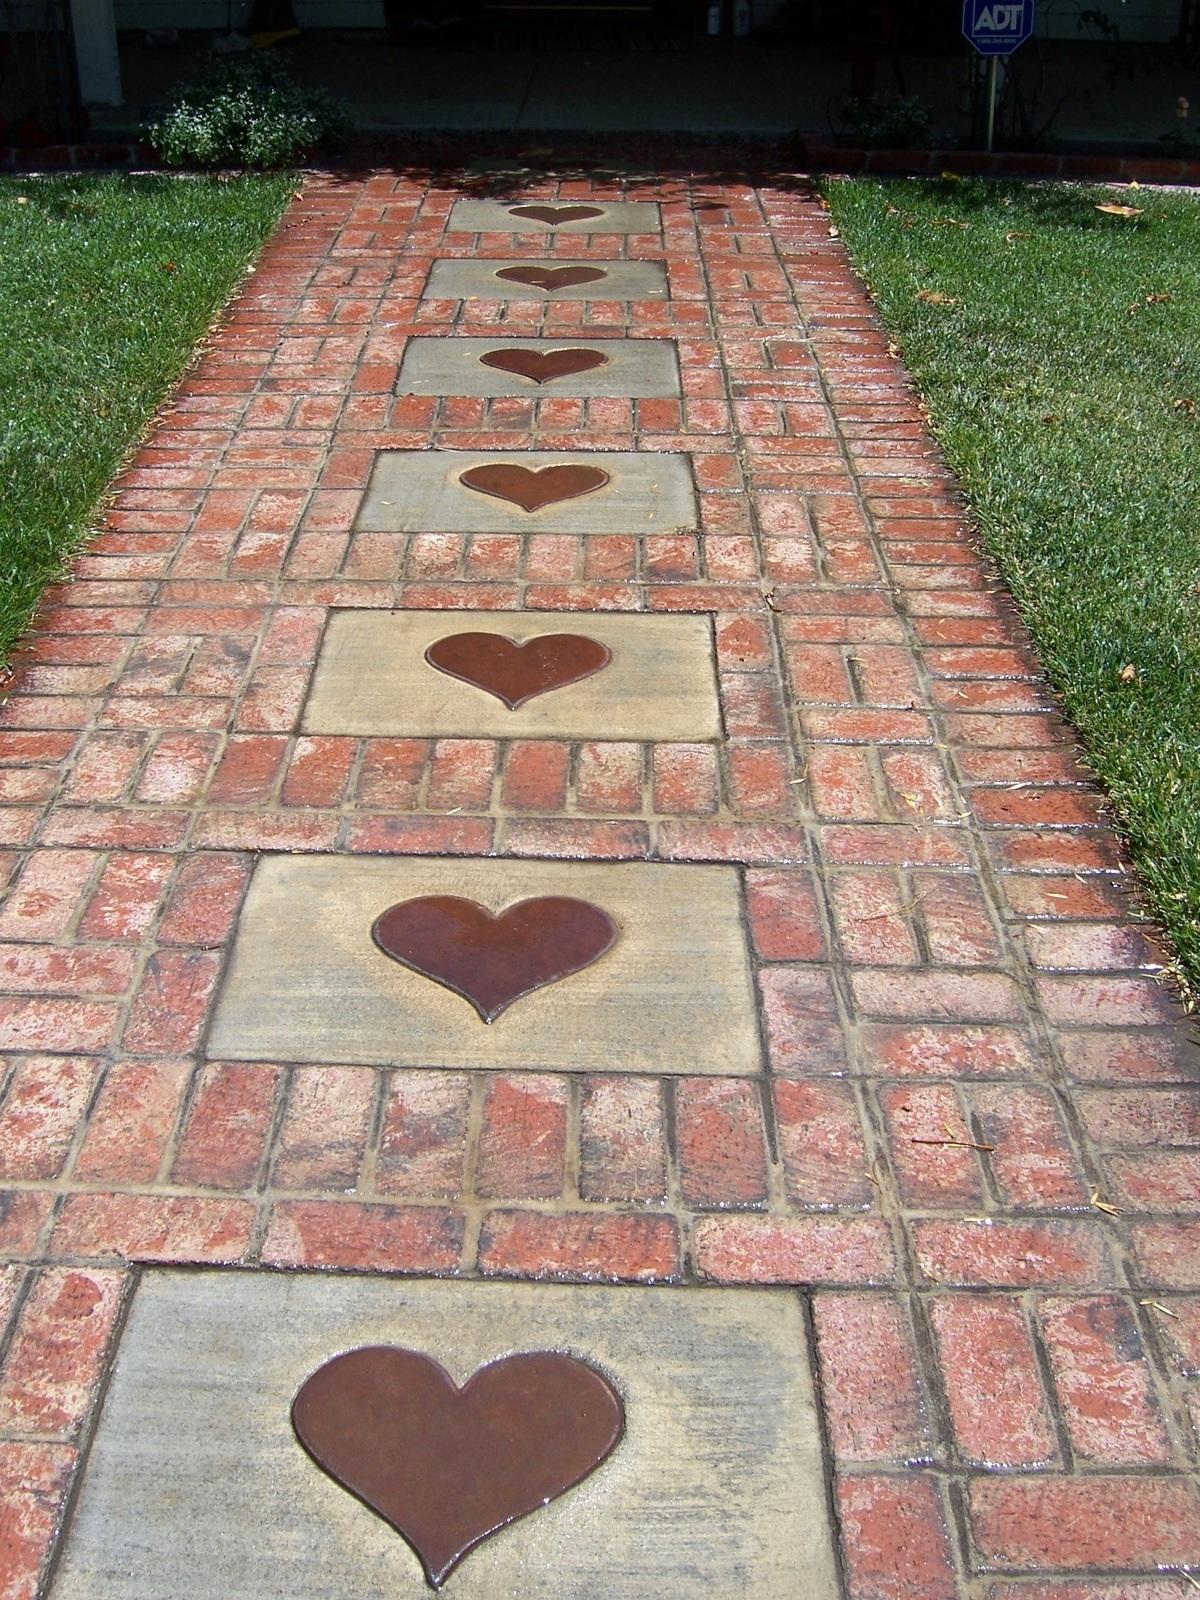 Hearts in the Walkway